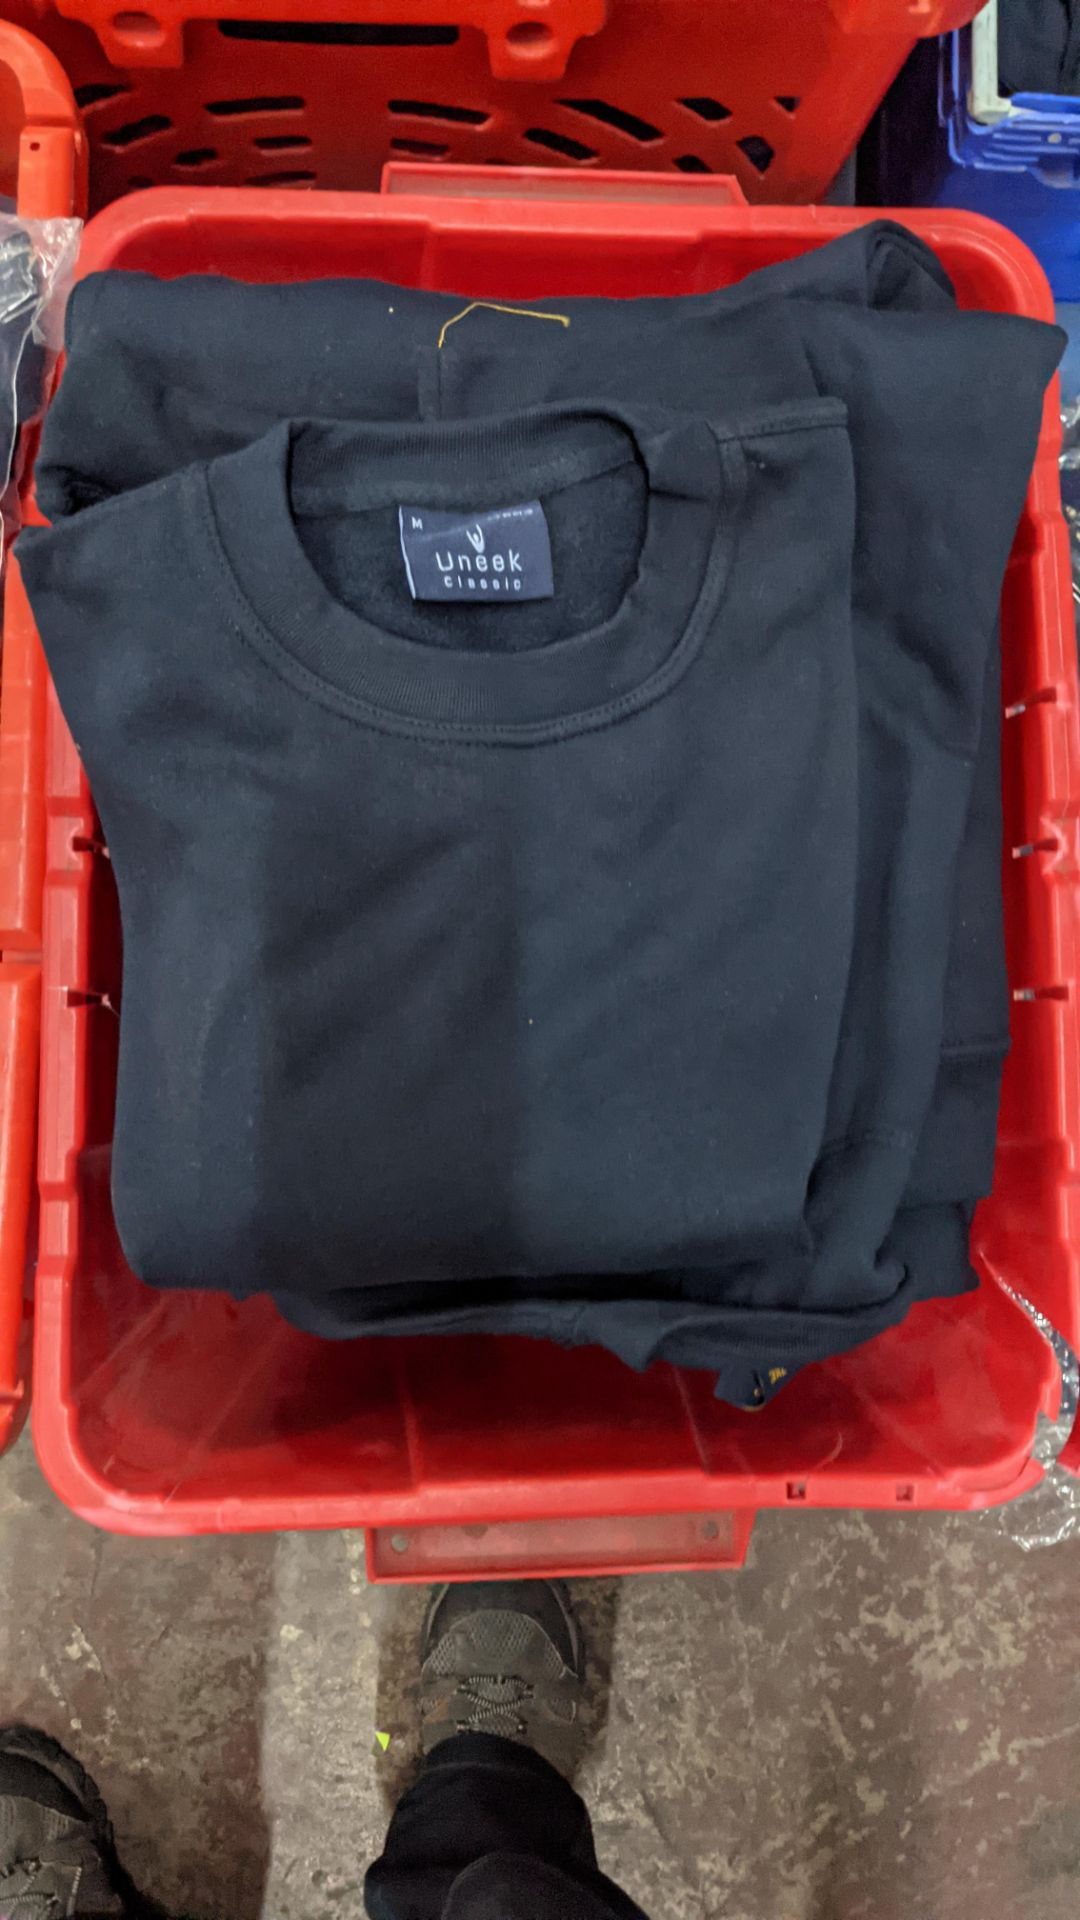 Approx 12 off navy sweatshirts - Image 4 of 5